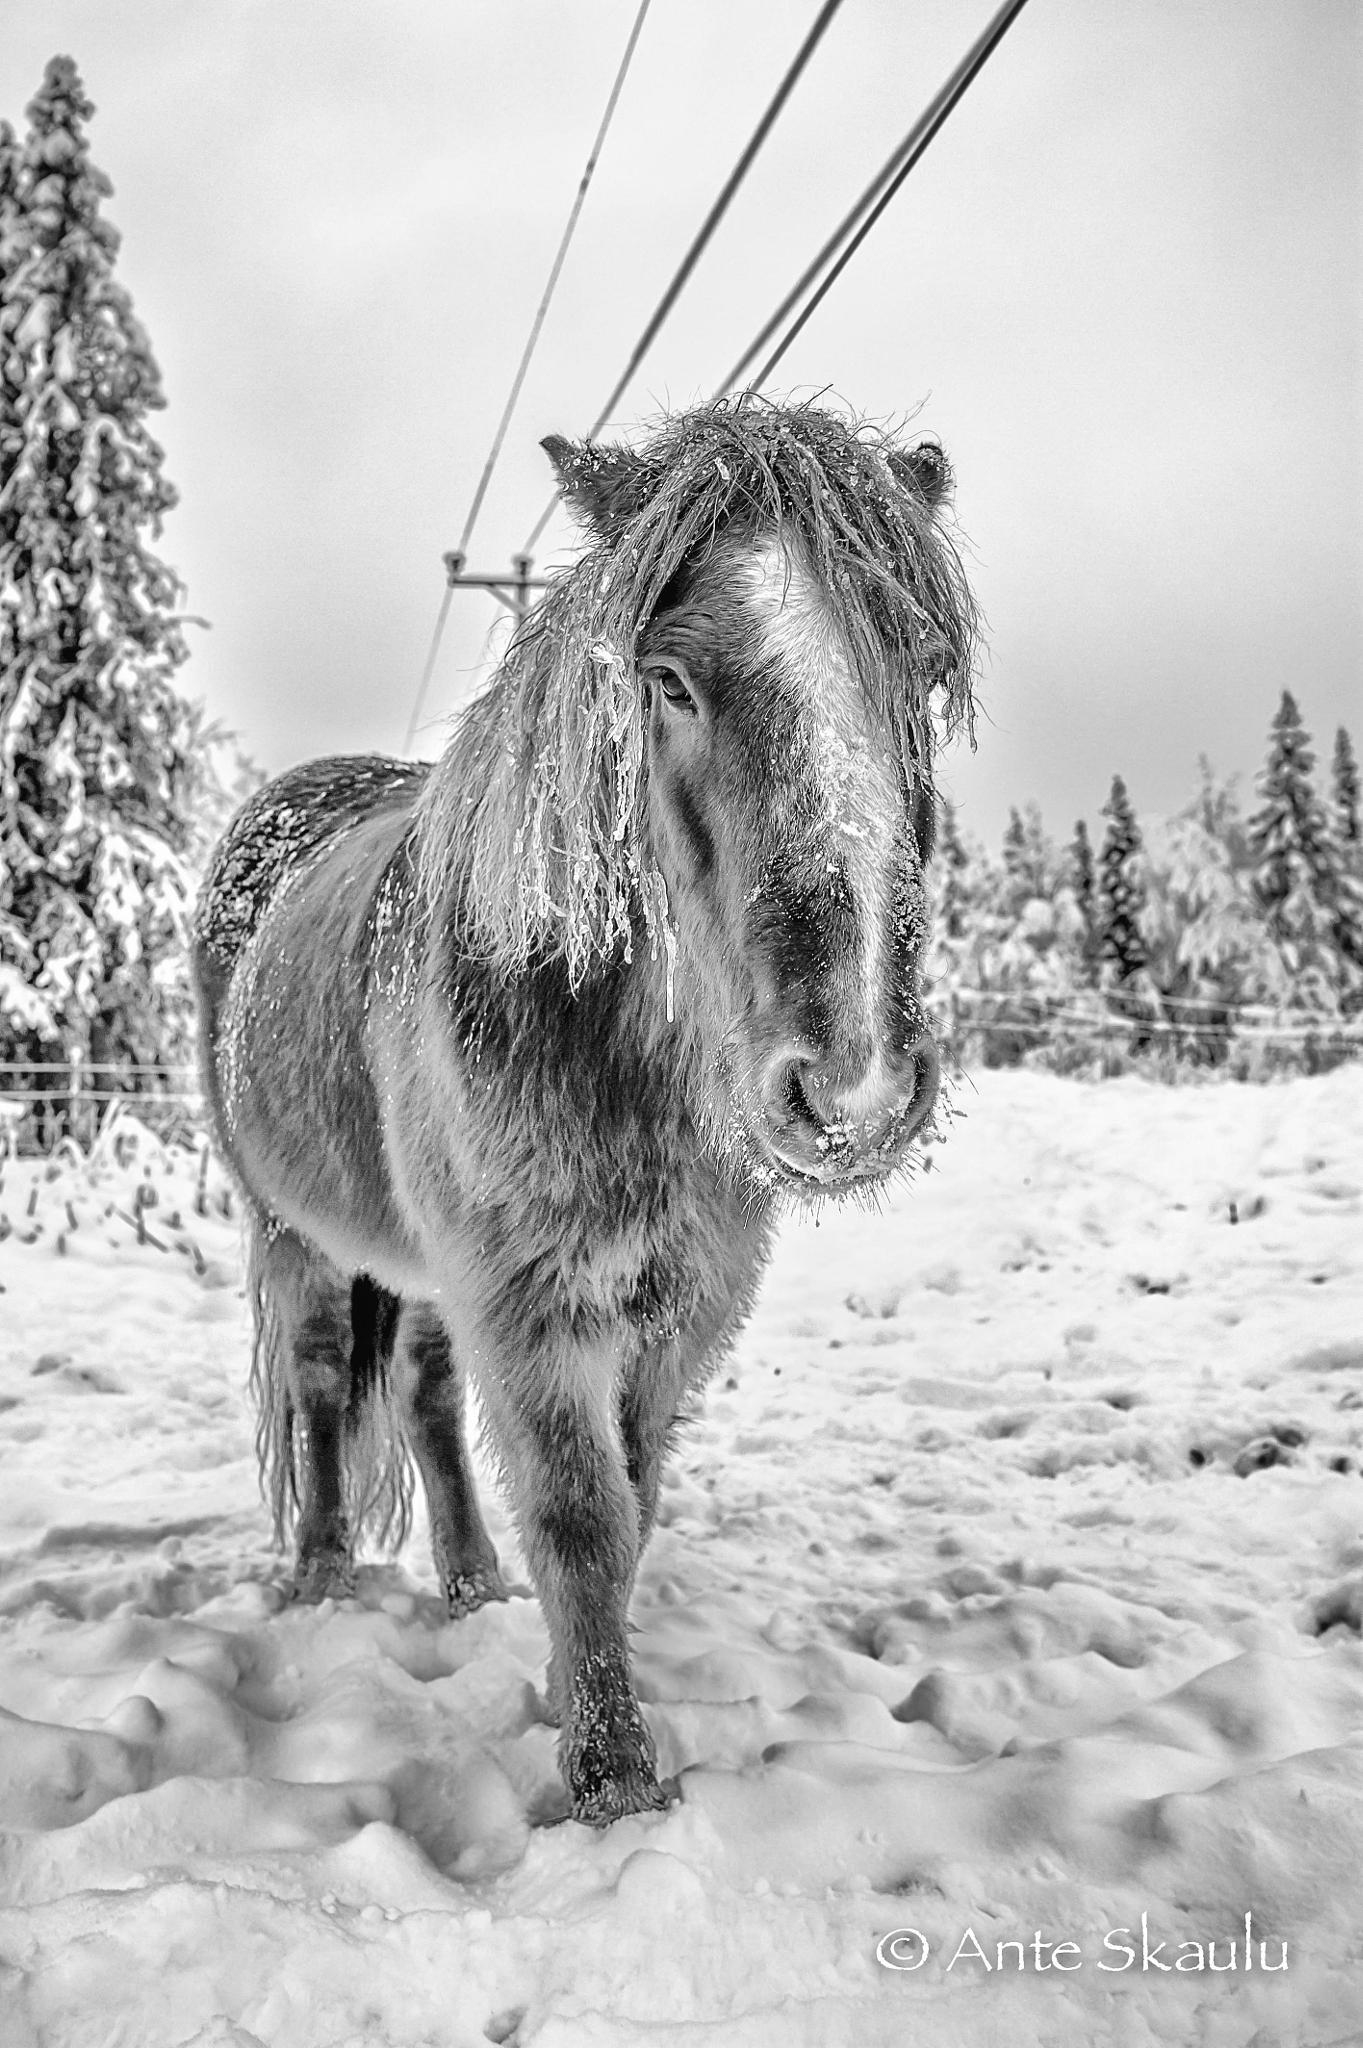 Dofri the icelander by Ante Skaulu @skaulu_photo